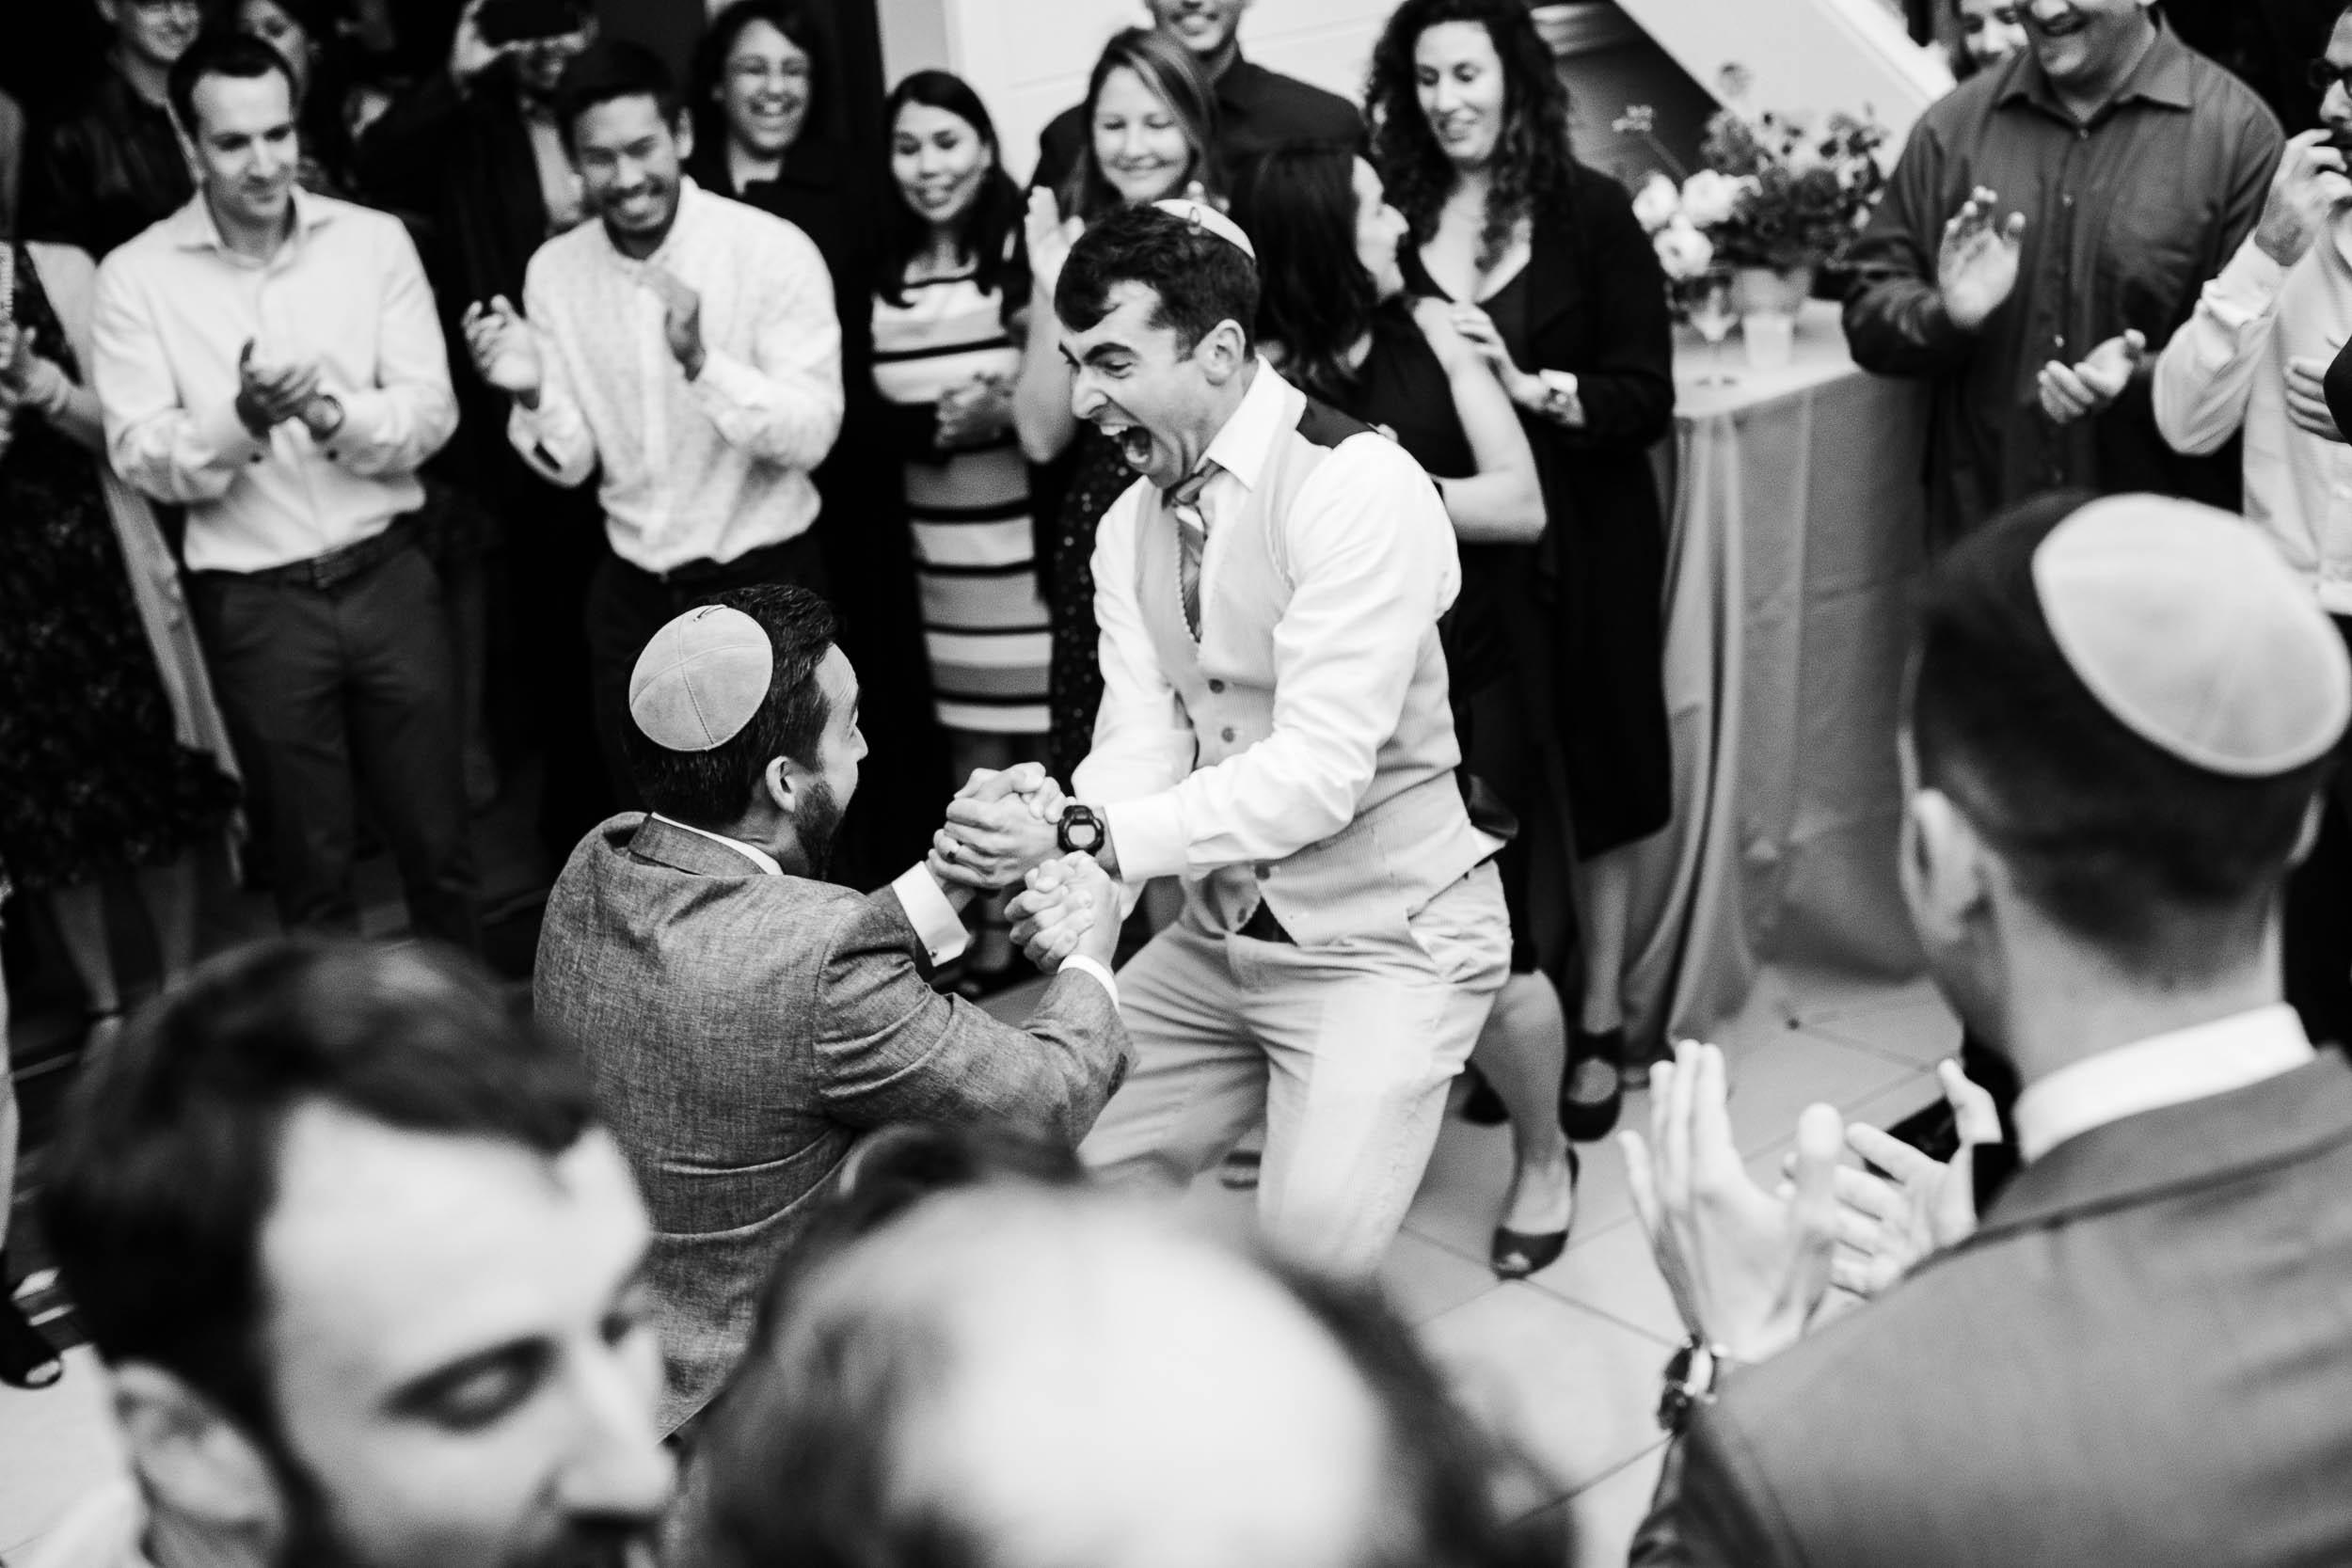 081818_Alina Jason San Francisco Wedding_Buena Lane Photography_2799 copy.jpg